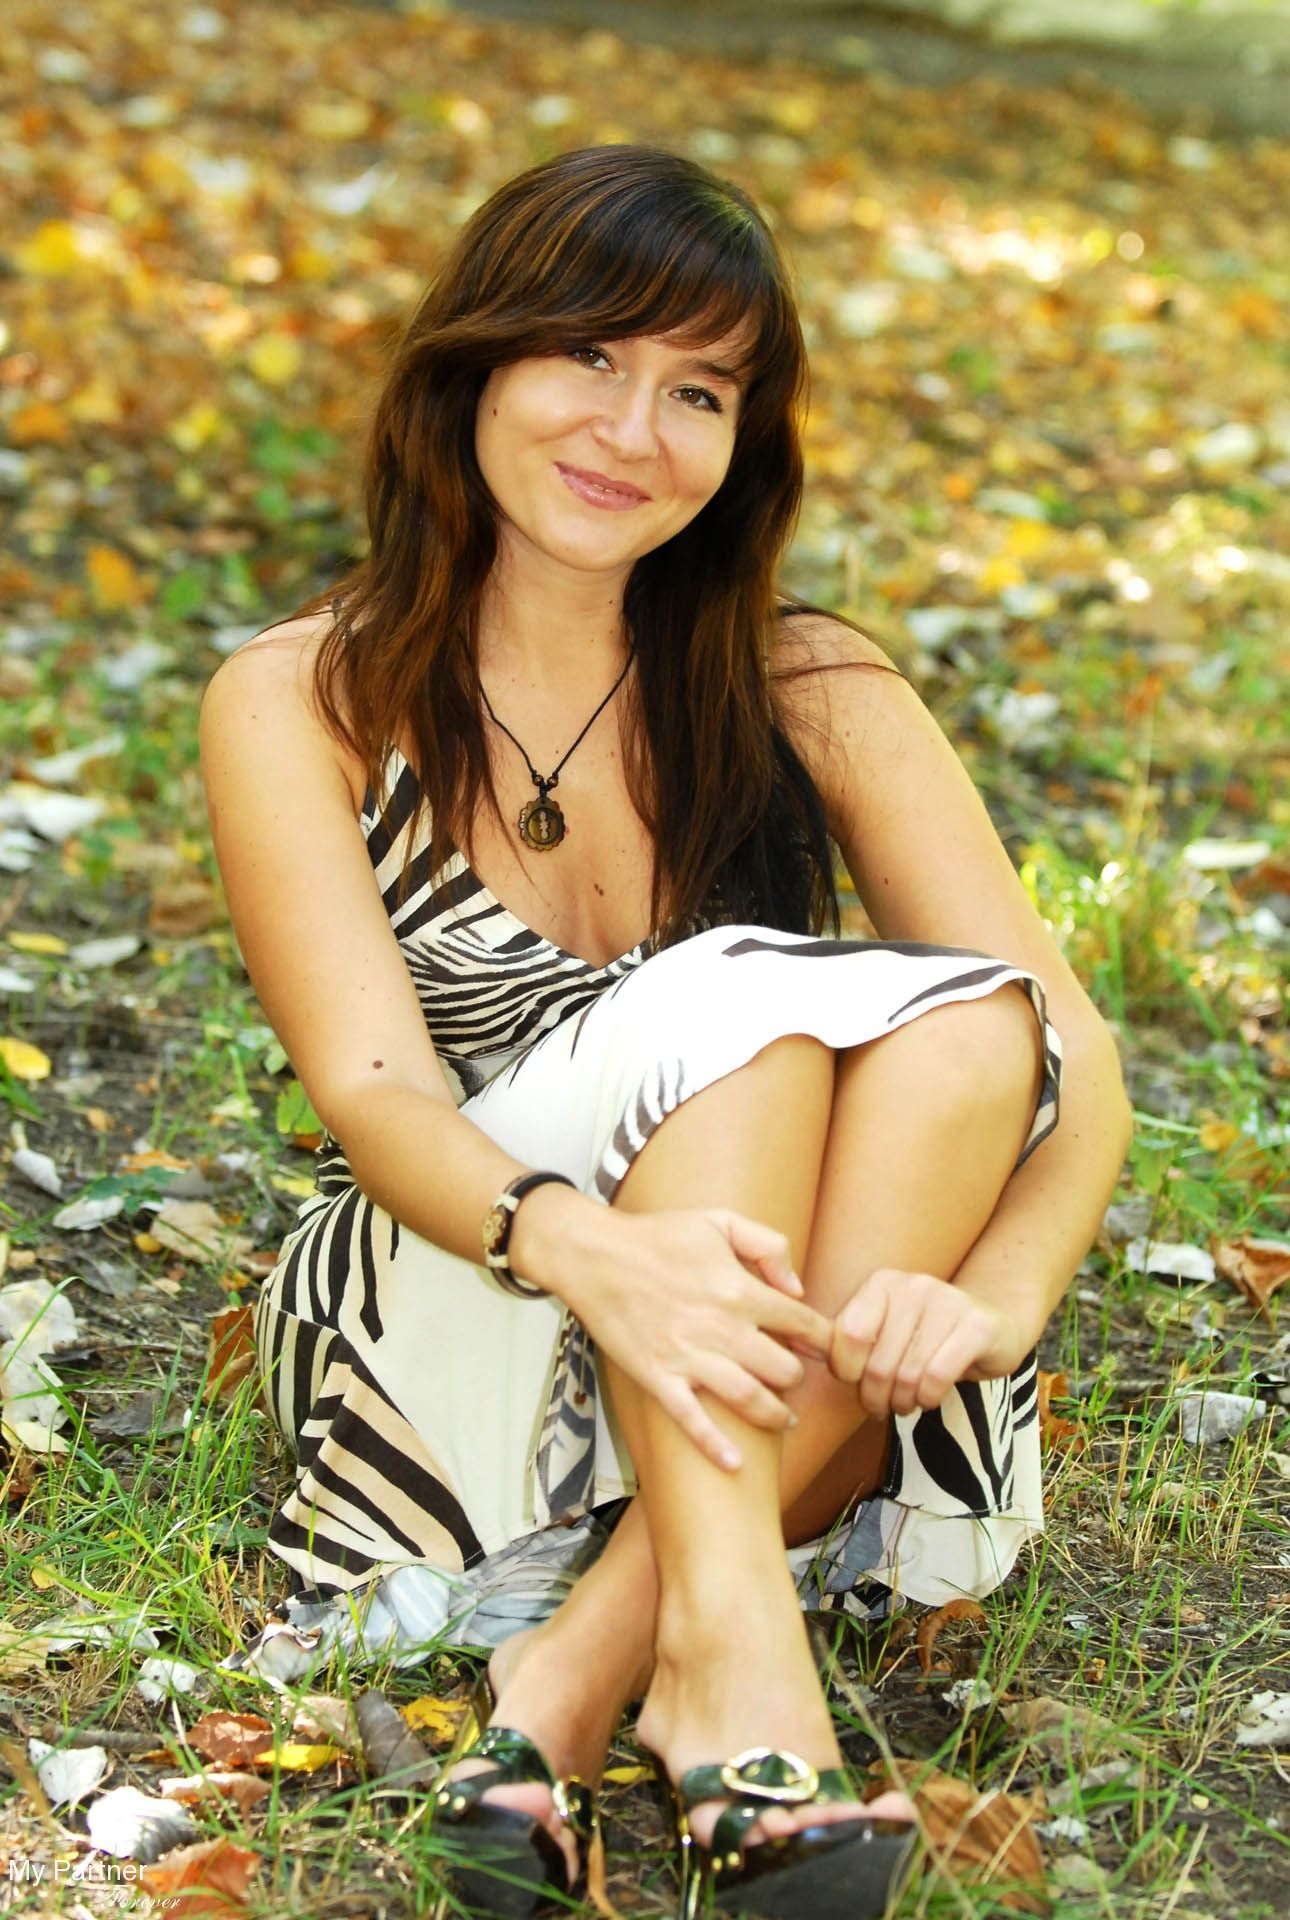 7 core beliefs of Russian and Ukrainian women in love